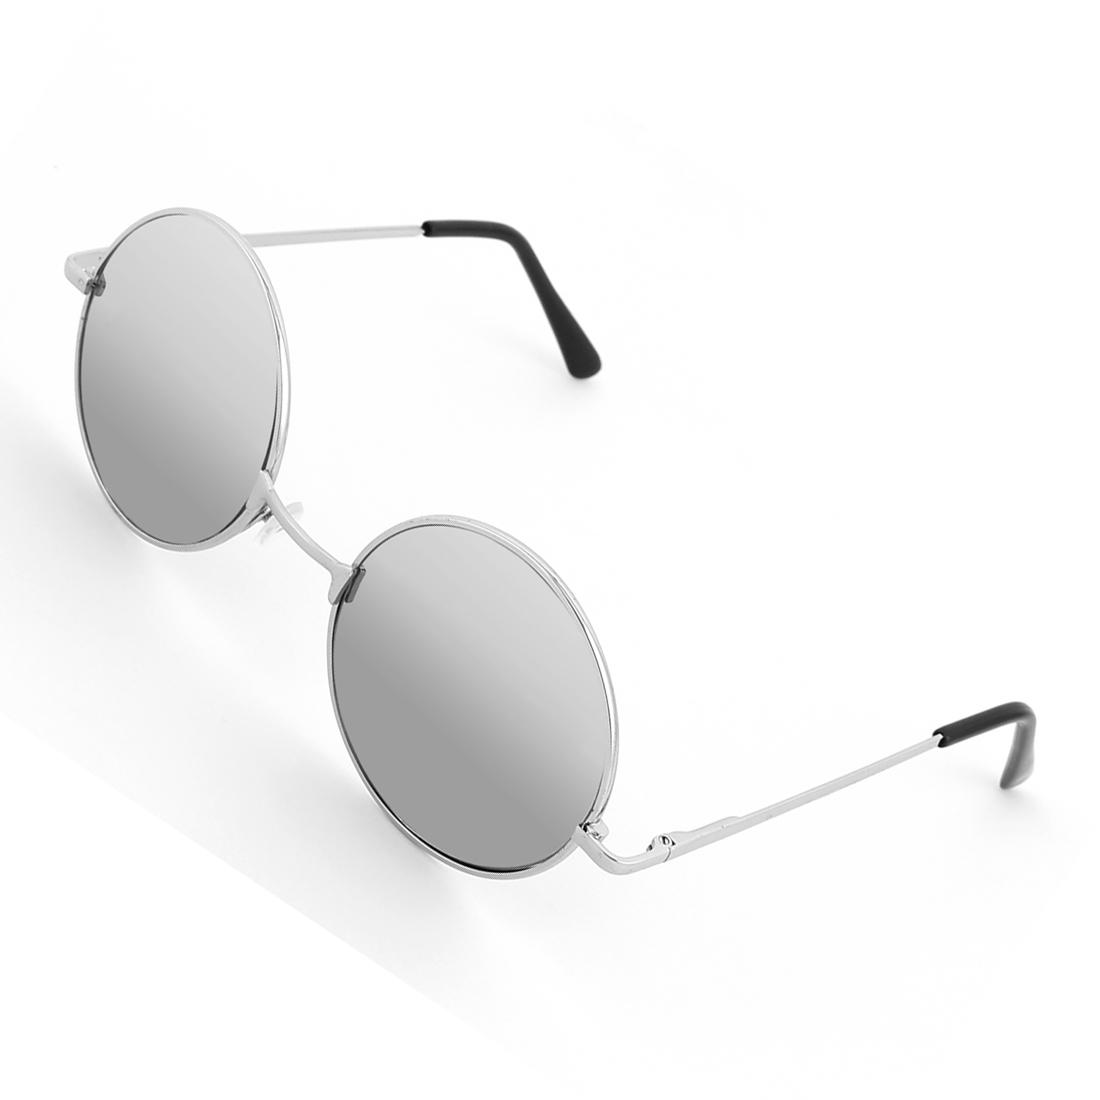 Vintage Retro Style Black Steampunk Sunglasses Round Glasses Goggles